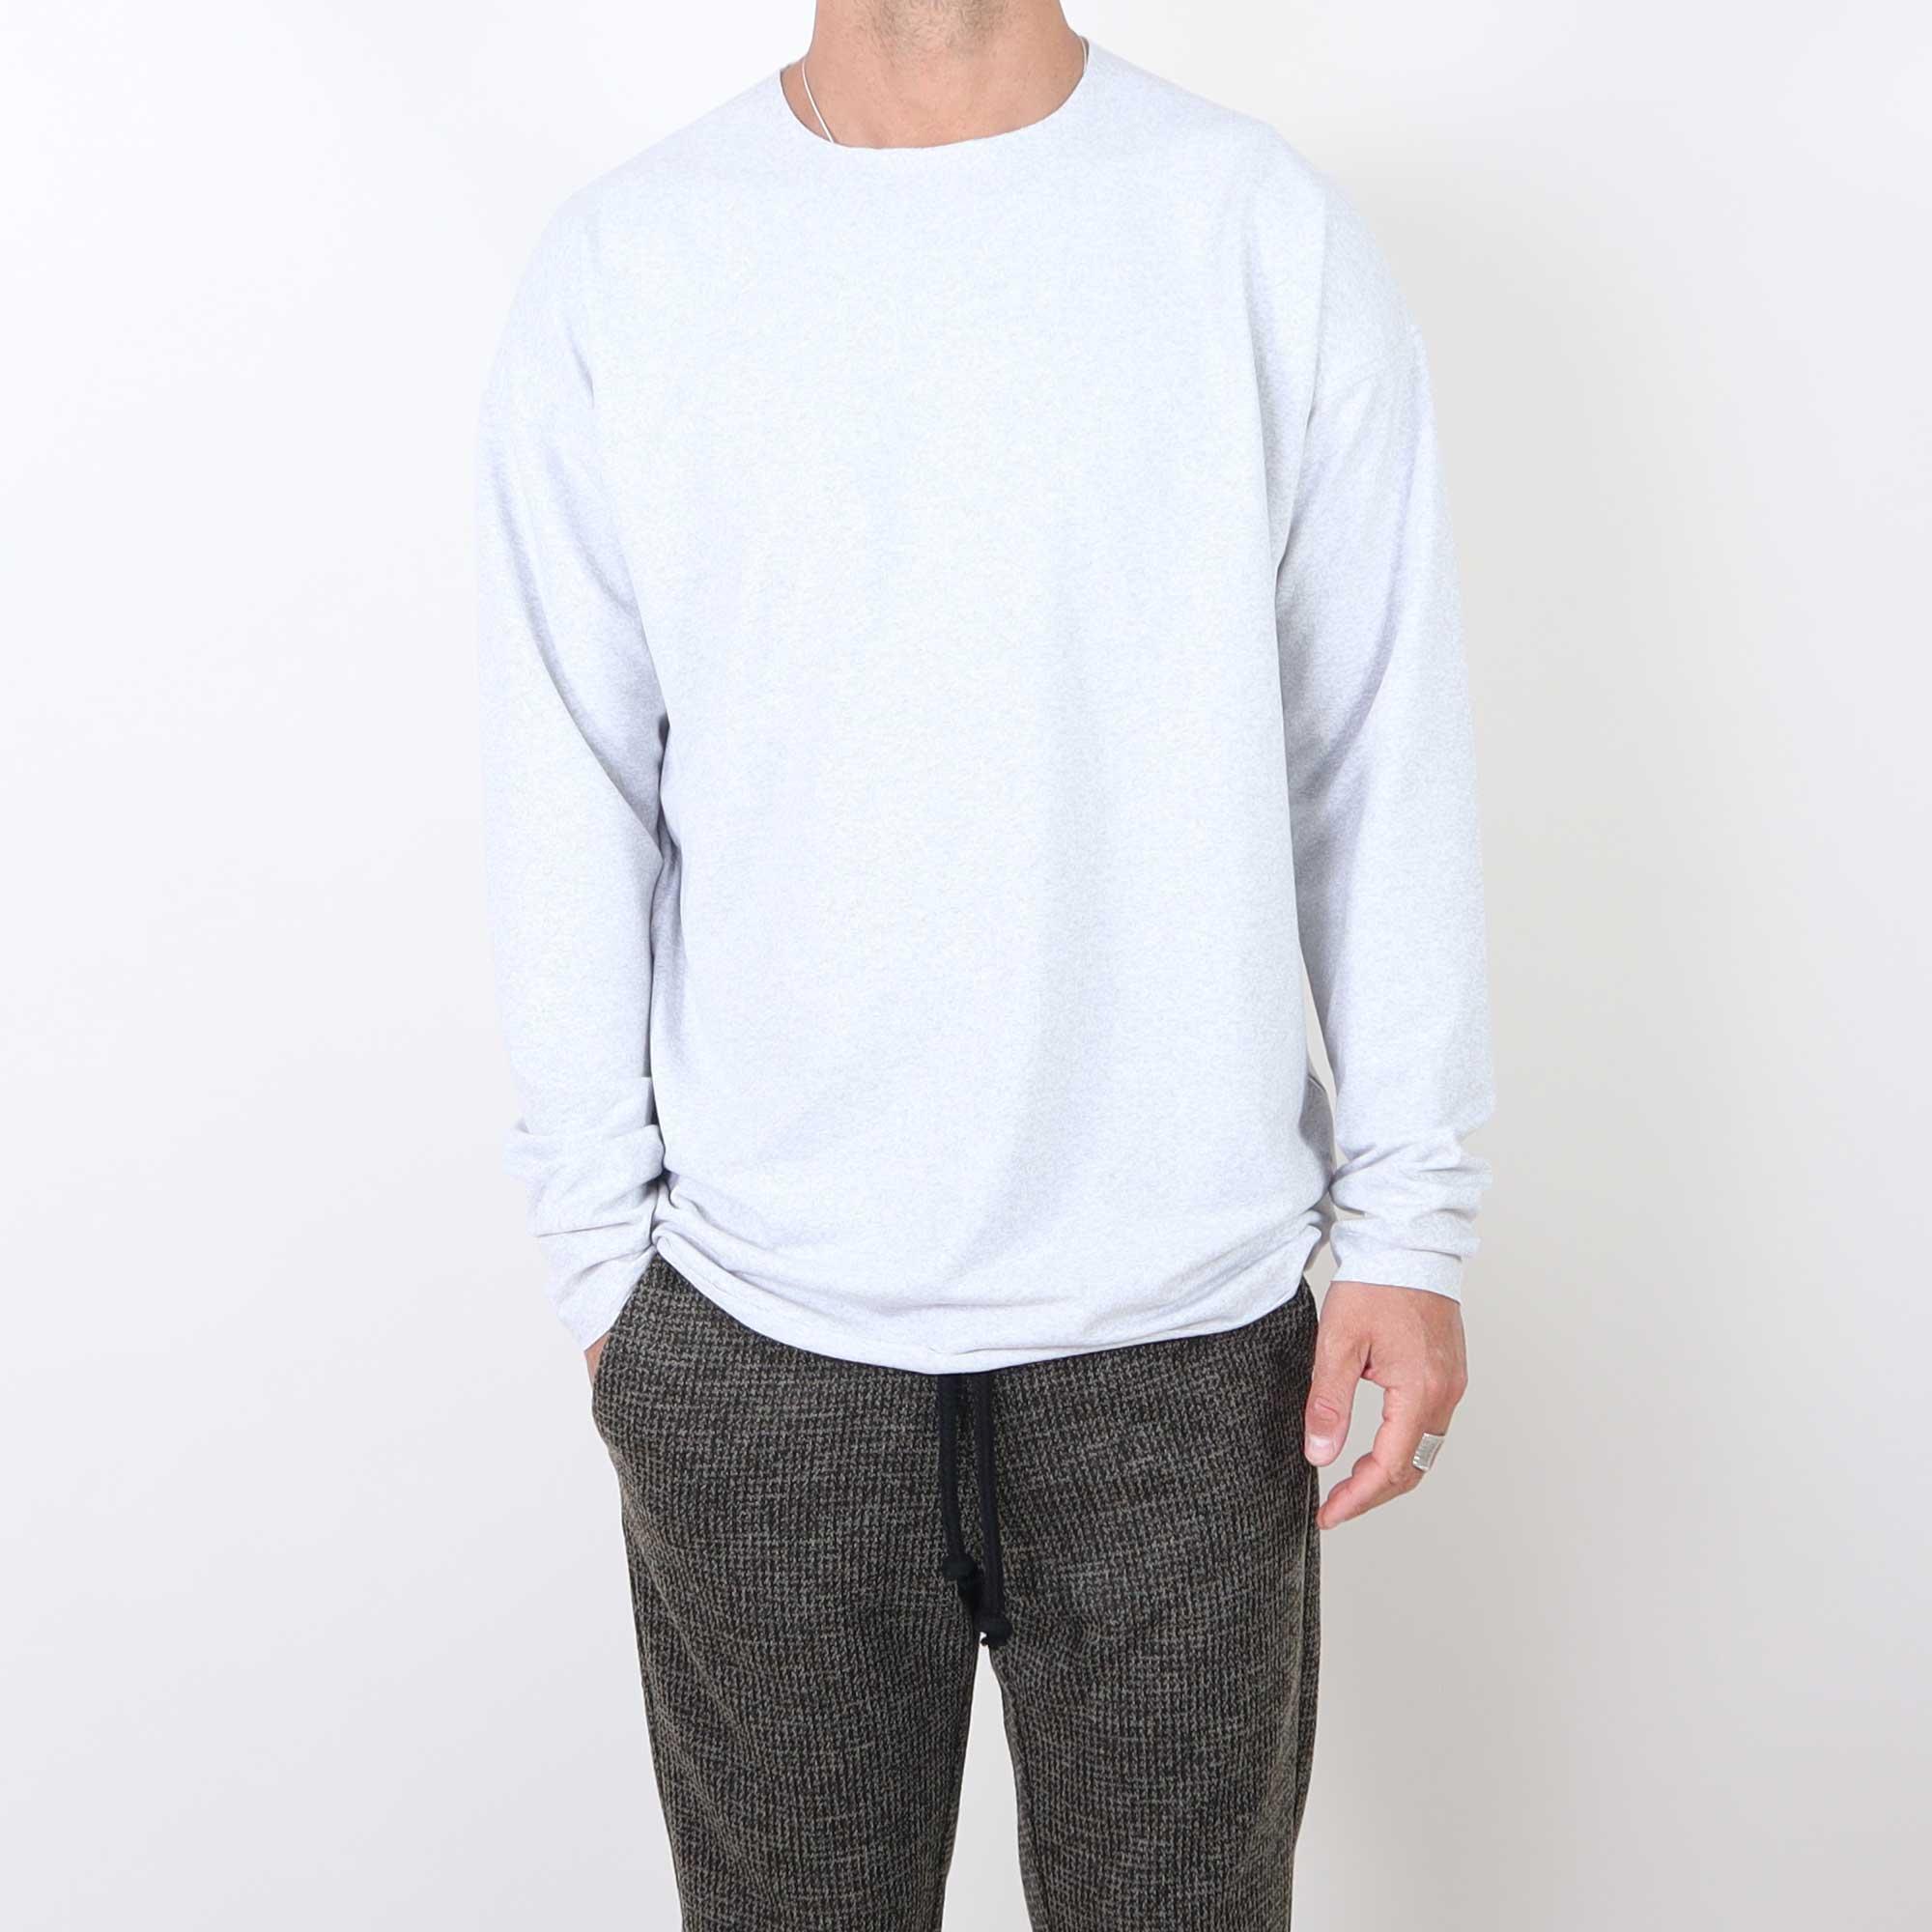 turn-longsleeve-grey-1